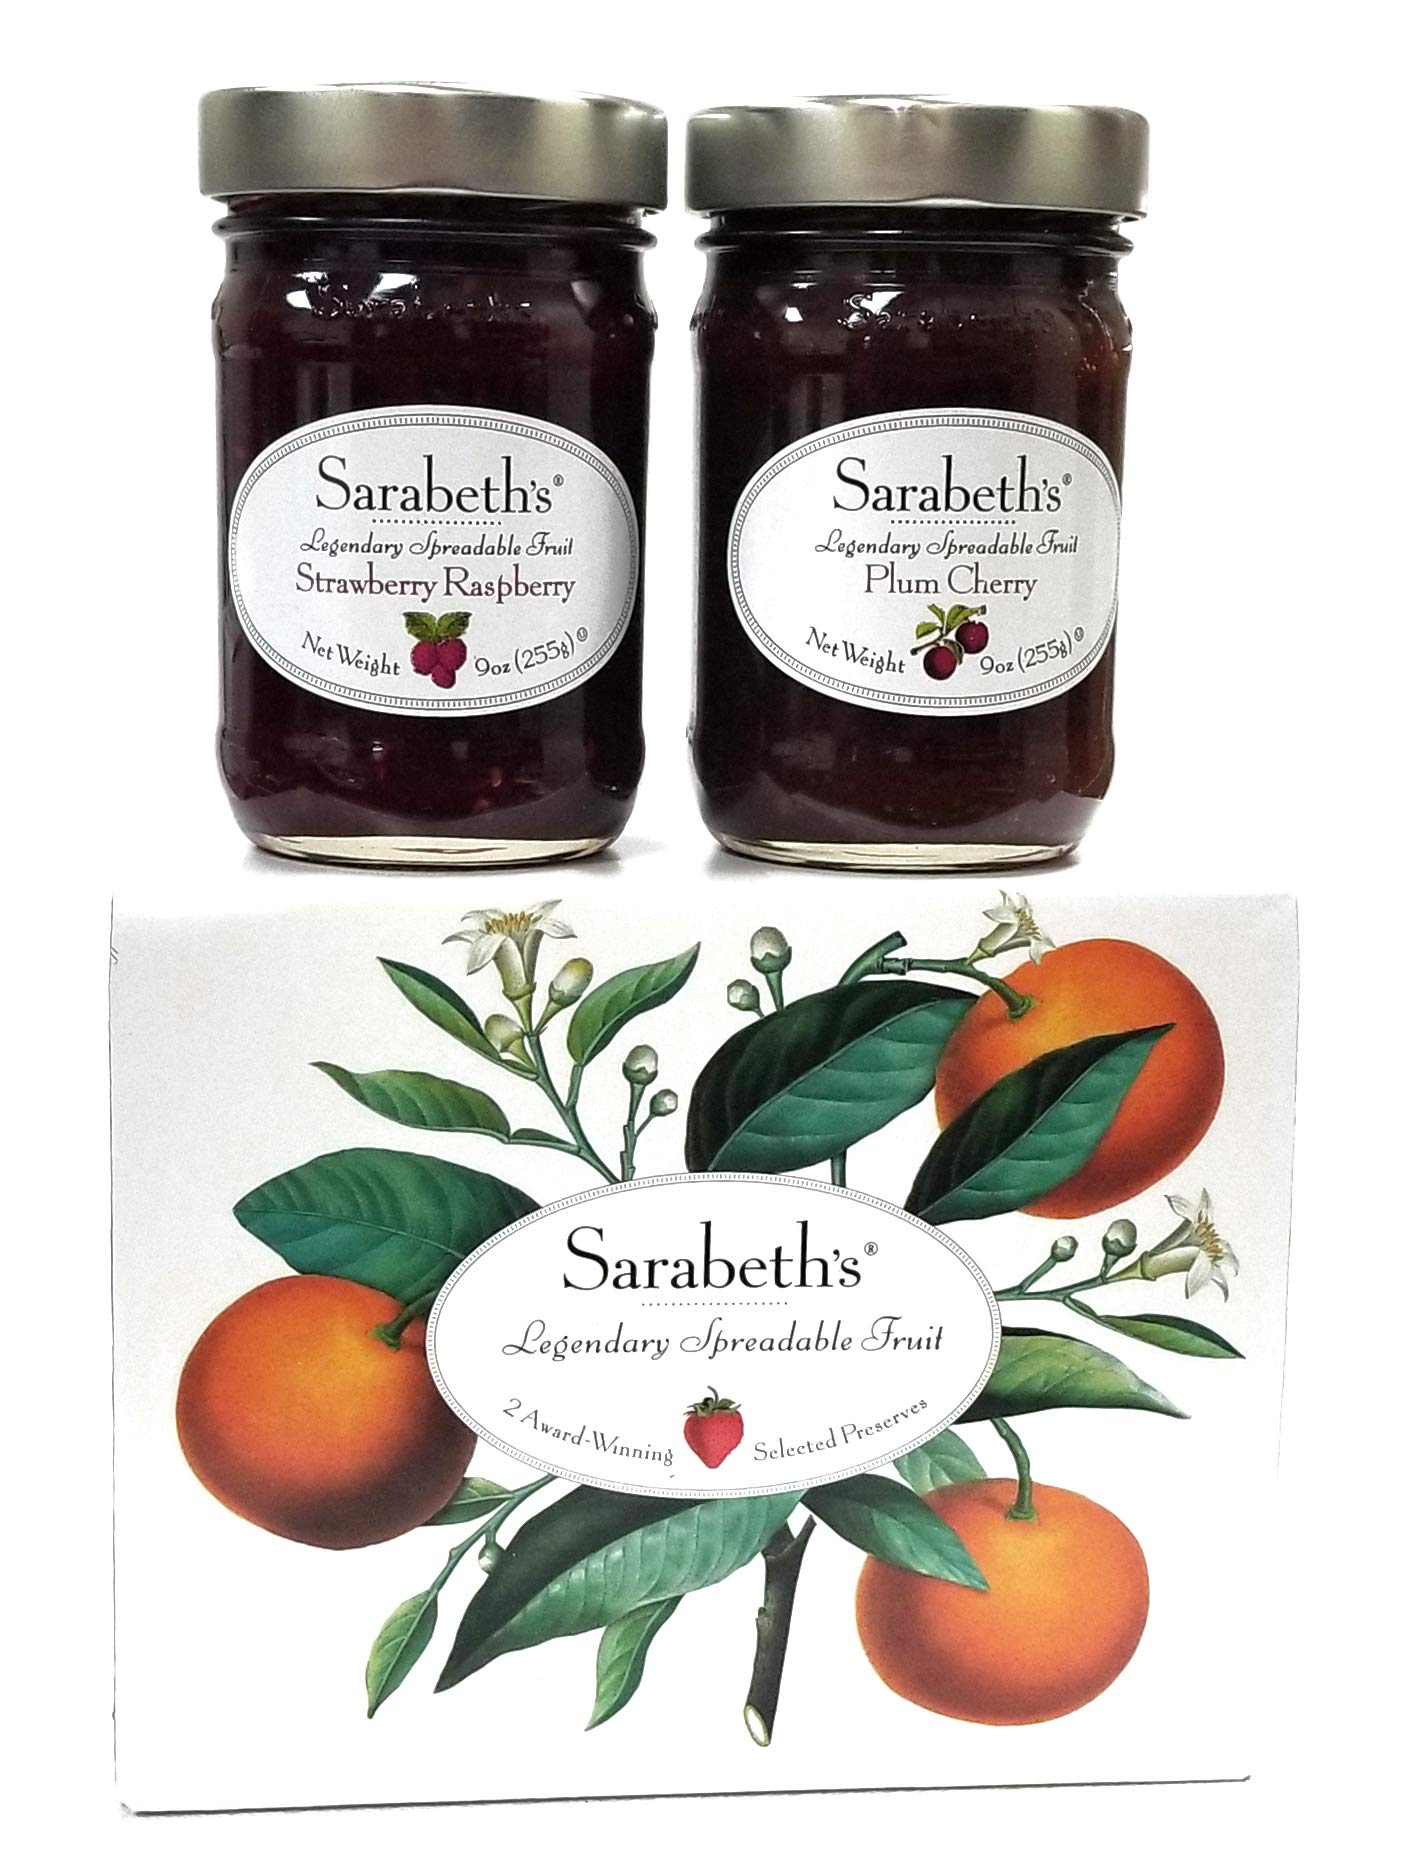 Sarabeth's Fall Two Jar Gift Box Set - Two 9 oz. jars - Plum Cherry and Strawberry Raspberry